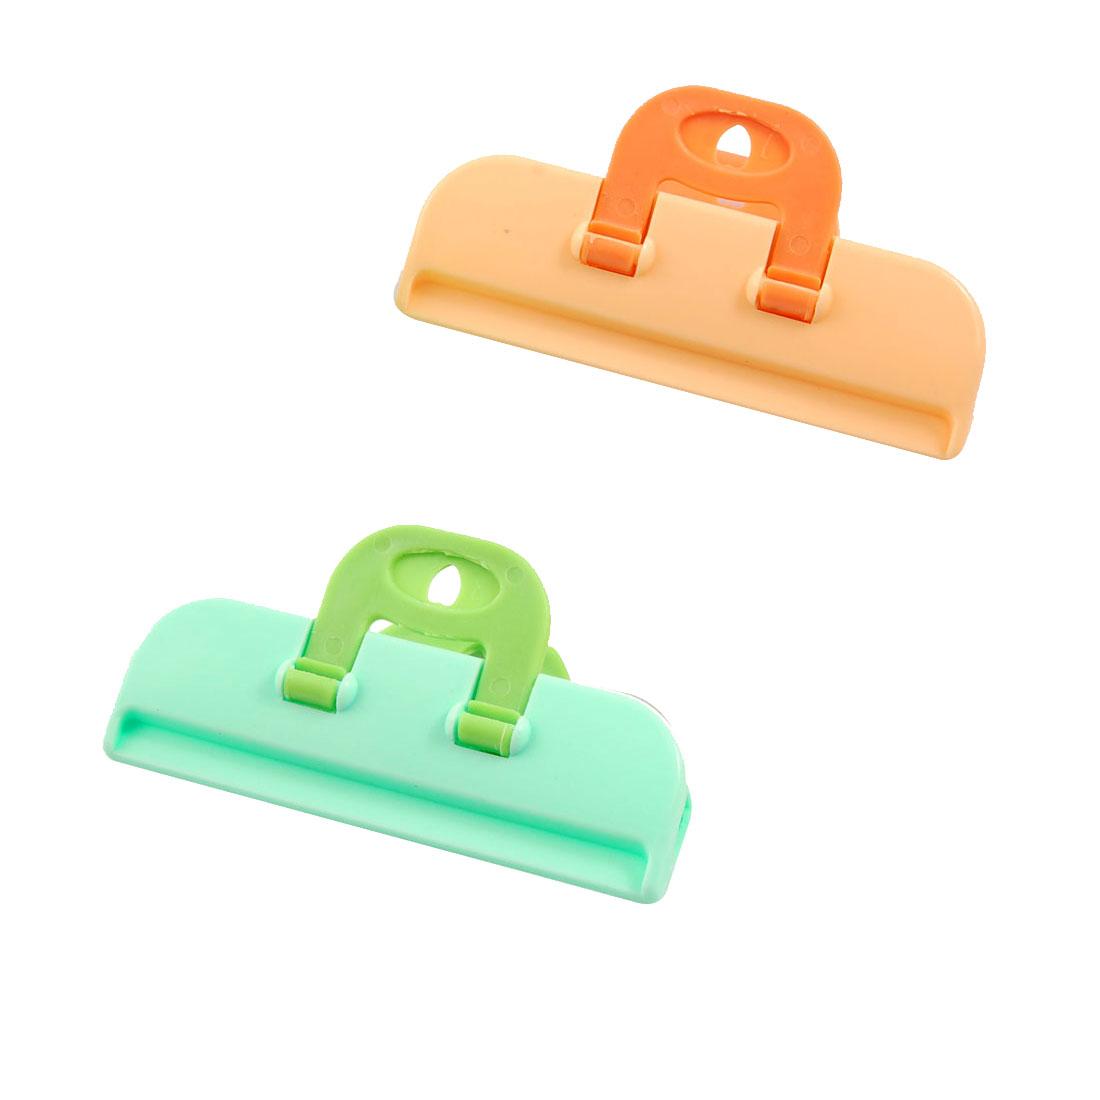 2 Pcs Food Storage Bag Orange Green Plastic Sealing Clip Clamp